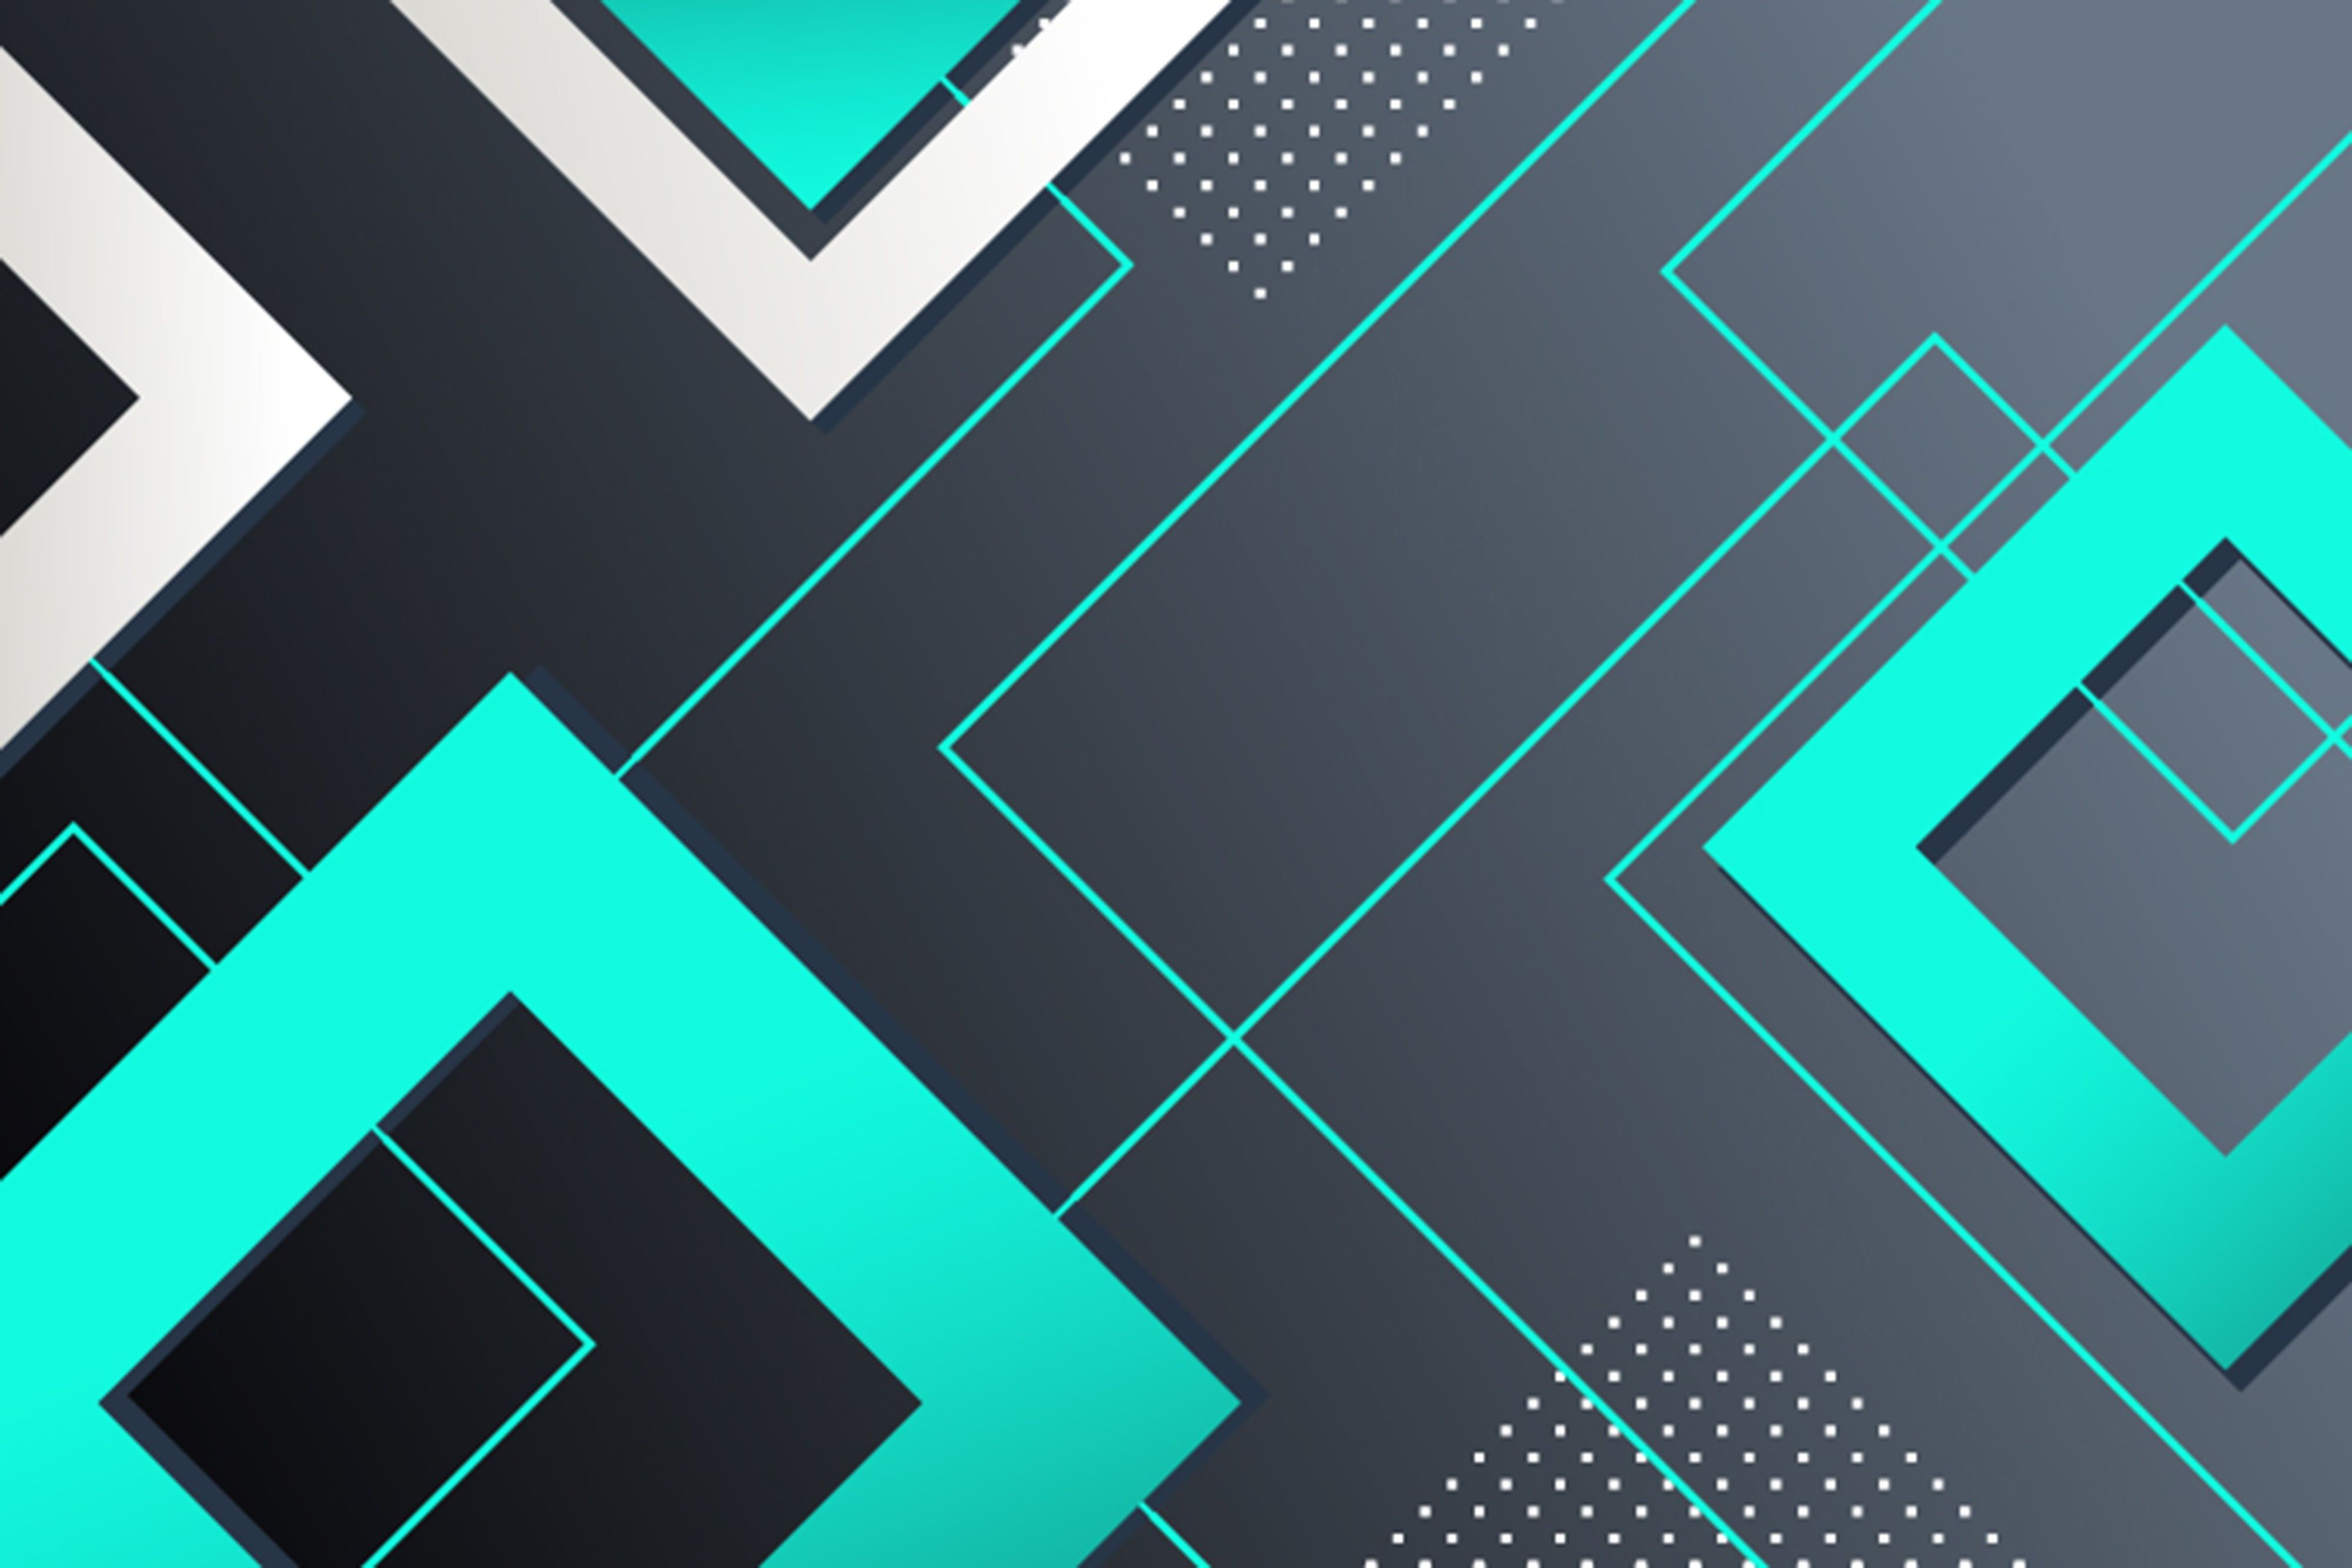 Line Background Abstract Background Geometric 4k Wallpaper Hdwallpaper Desktop In 2021 Hd Wallpaper Red And Black Wallpaper Black And Blue Wallpaper Geometric desktop wallpaper 4k